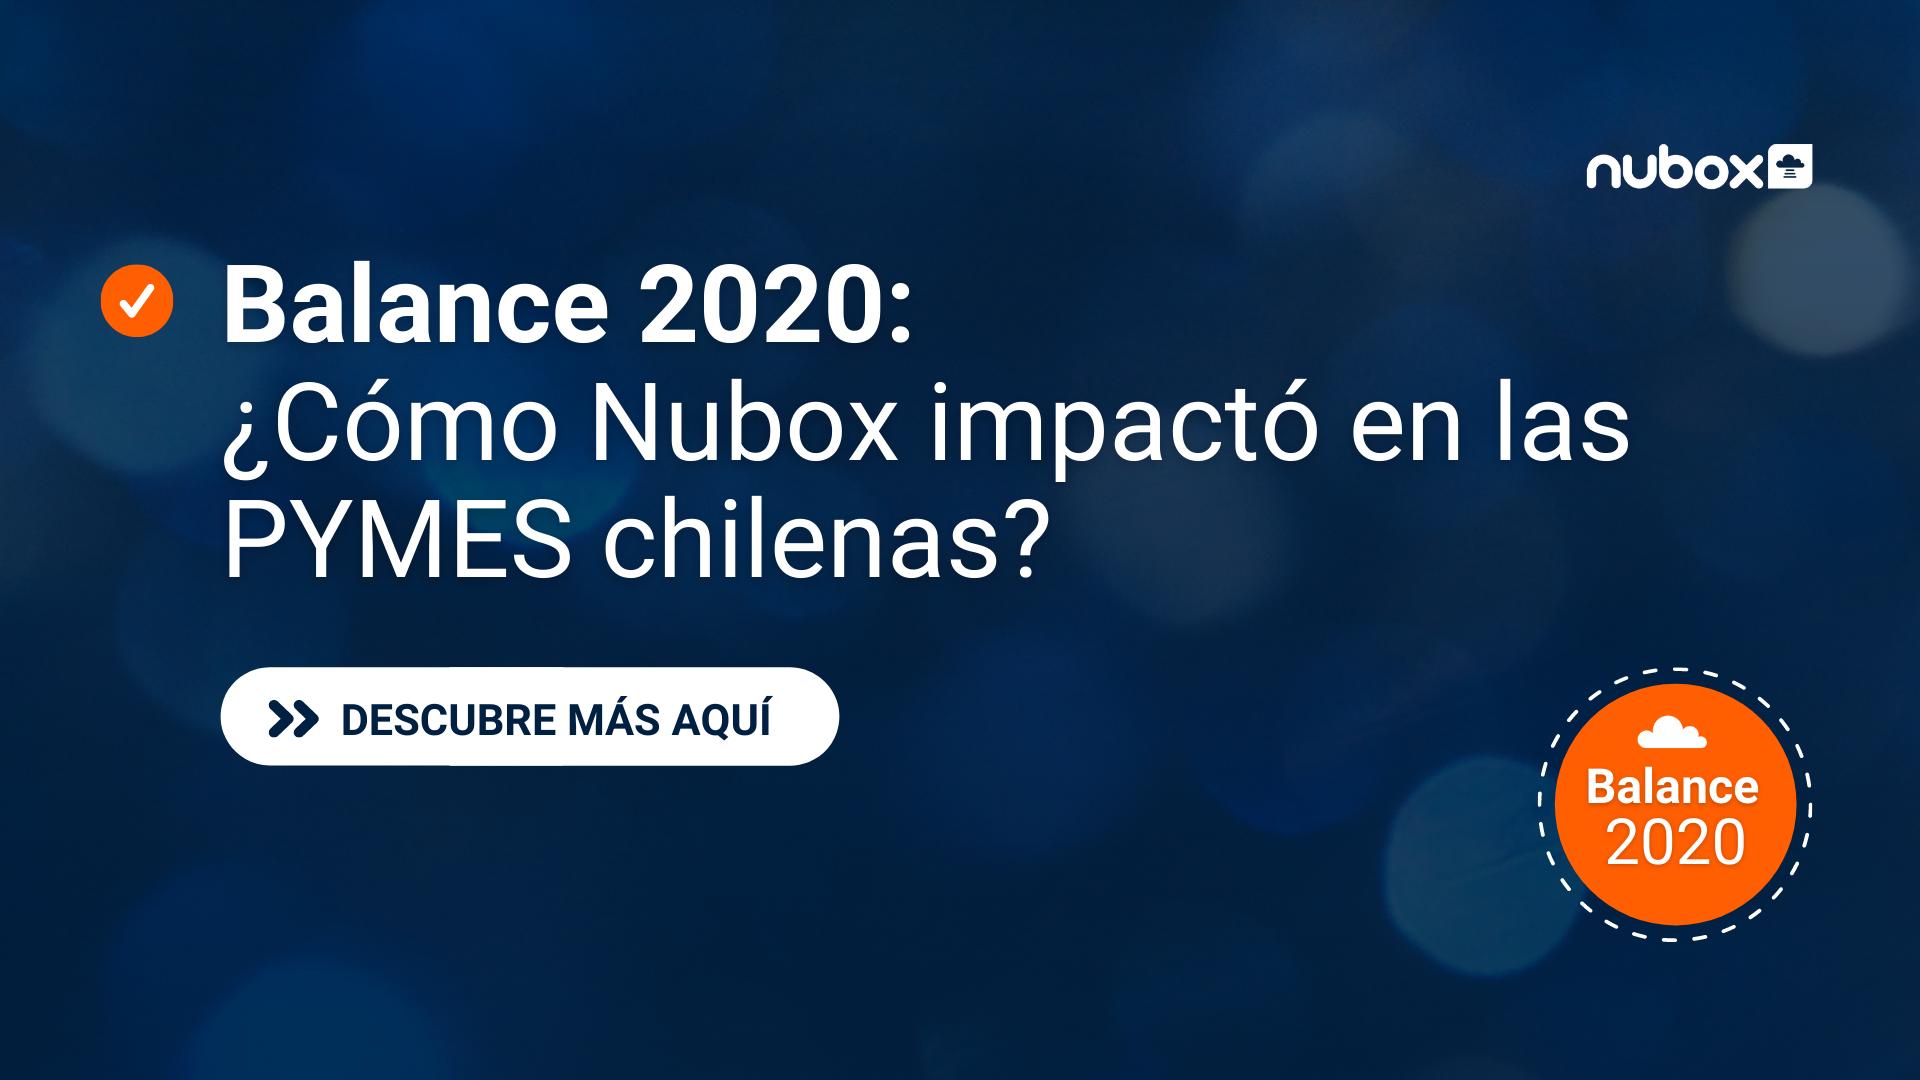 Balance 2020: Así ayudó Nubox a las Pymes